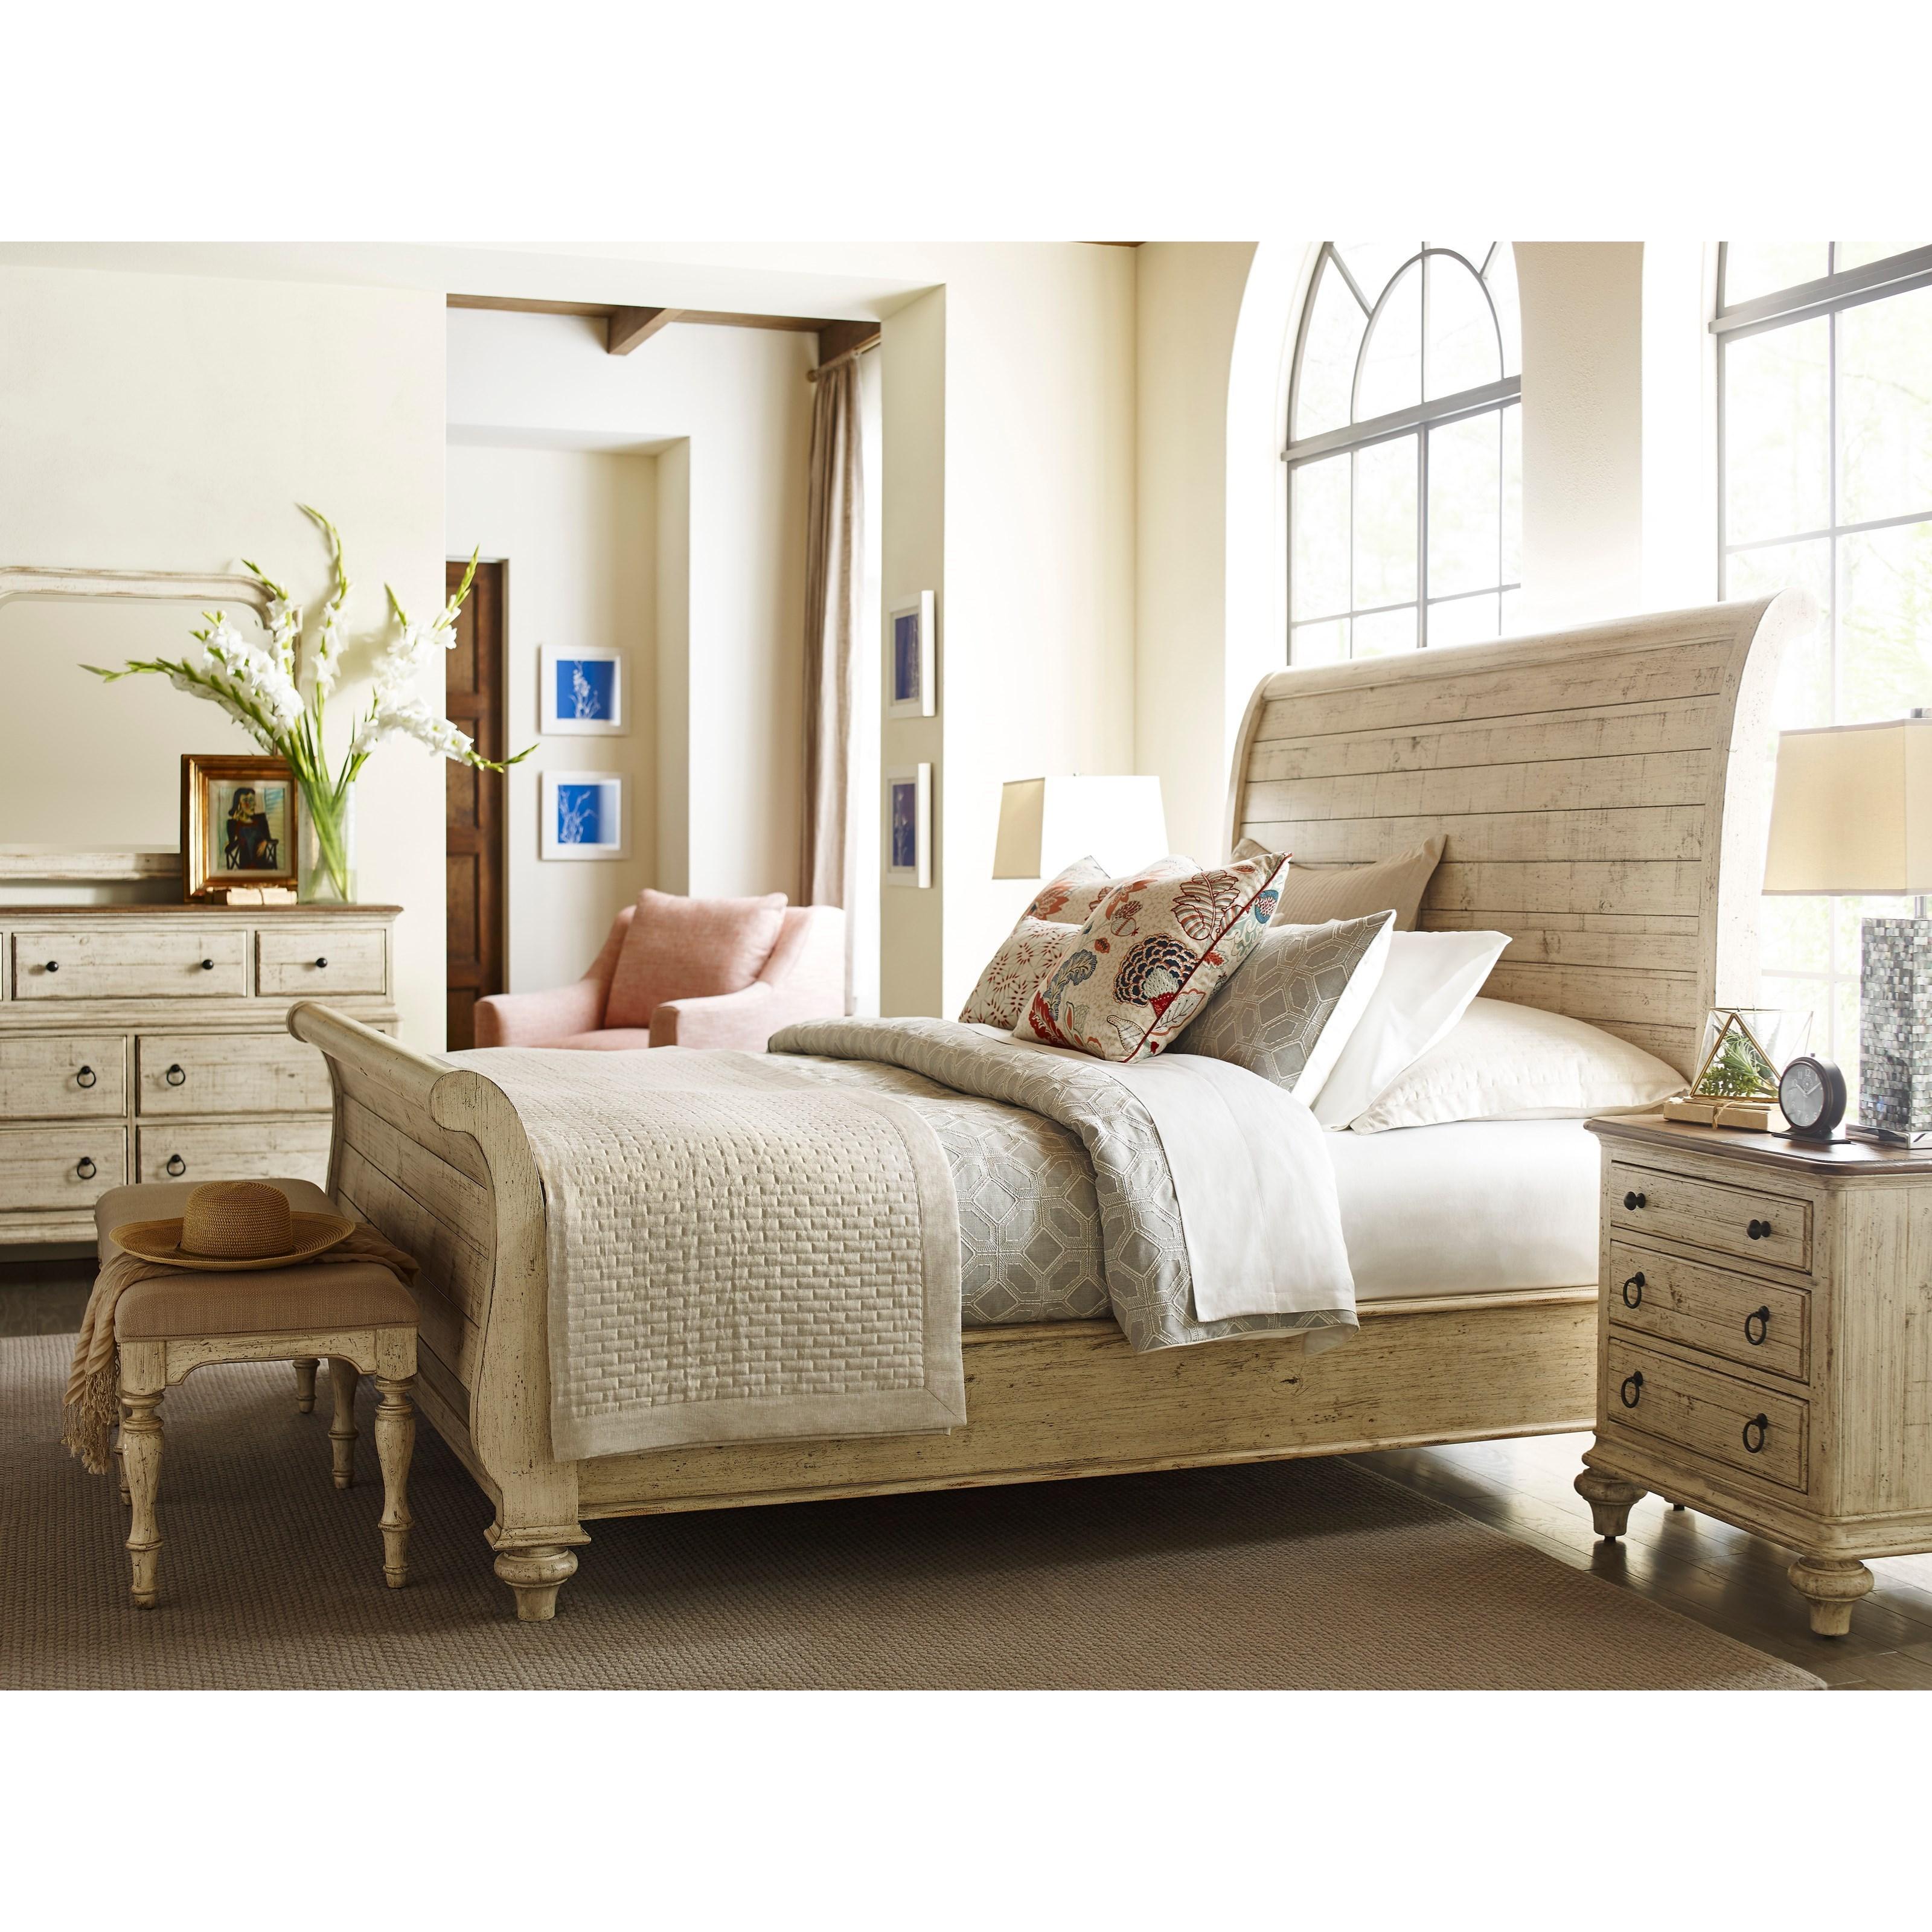 Kincaid Furniture Weatherford King Bedroom Group Hudson